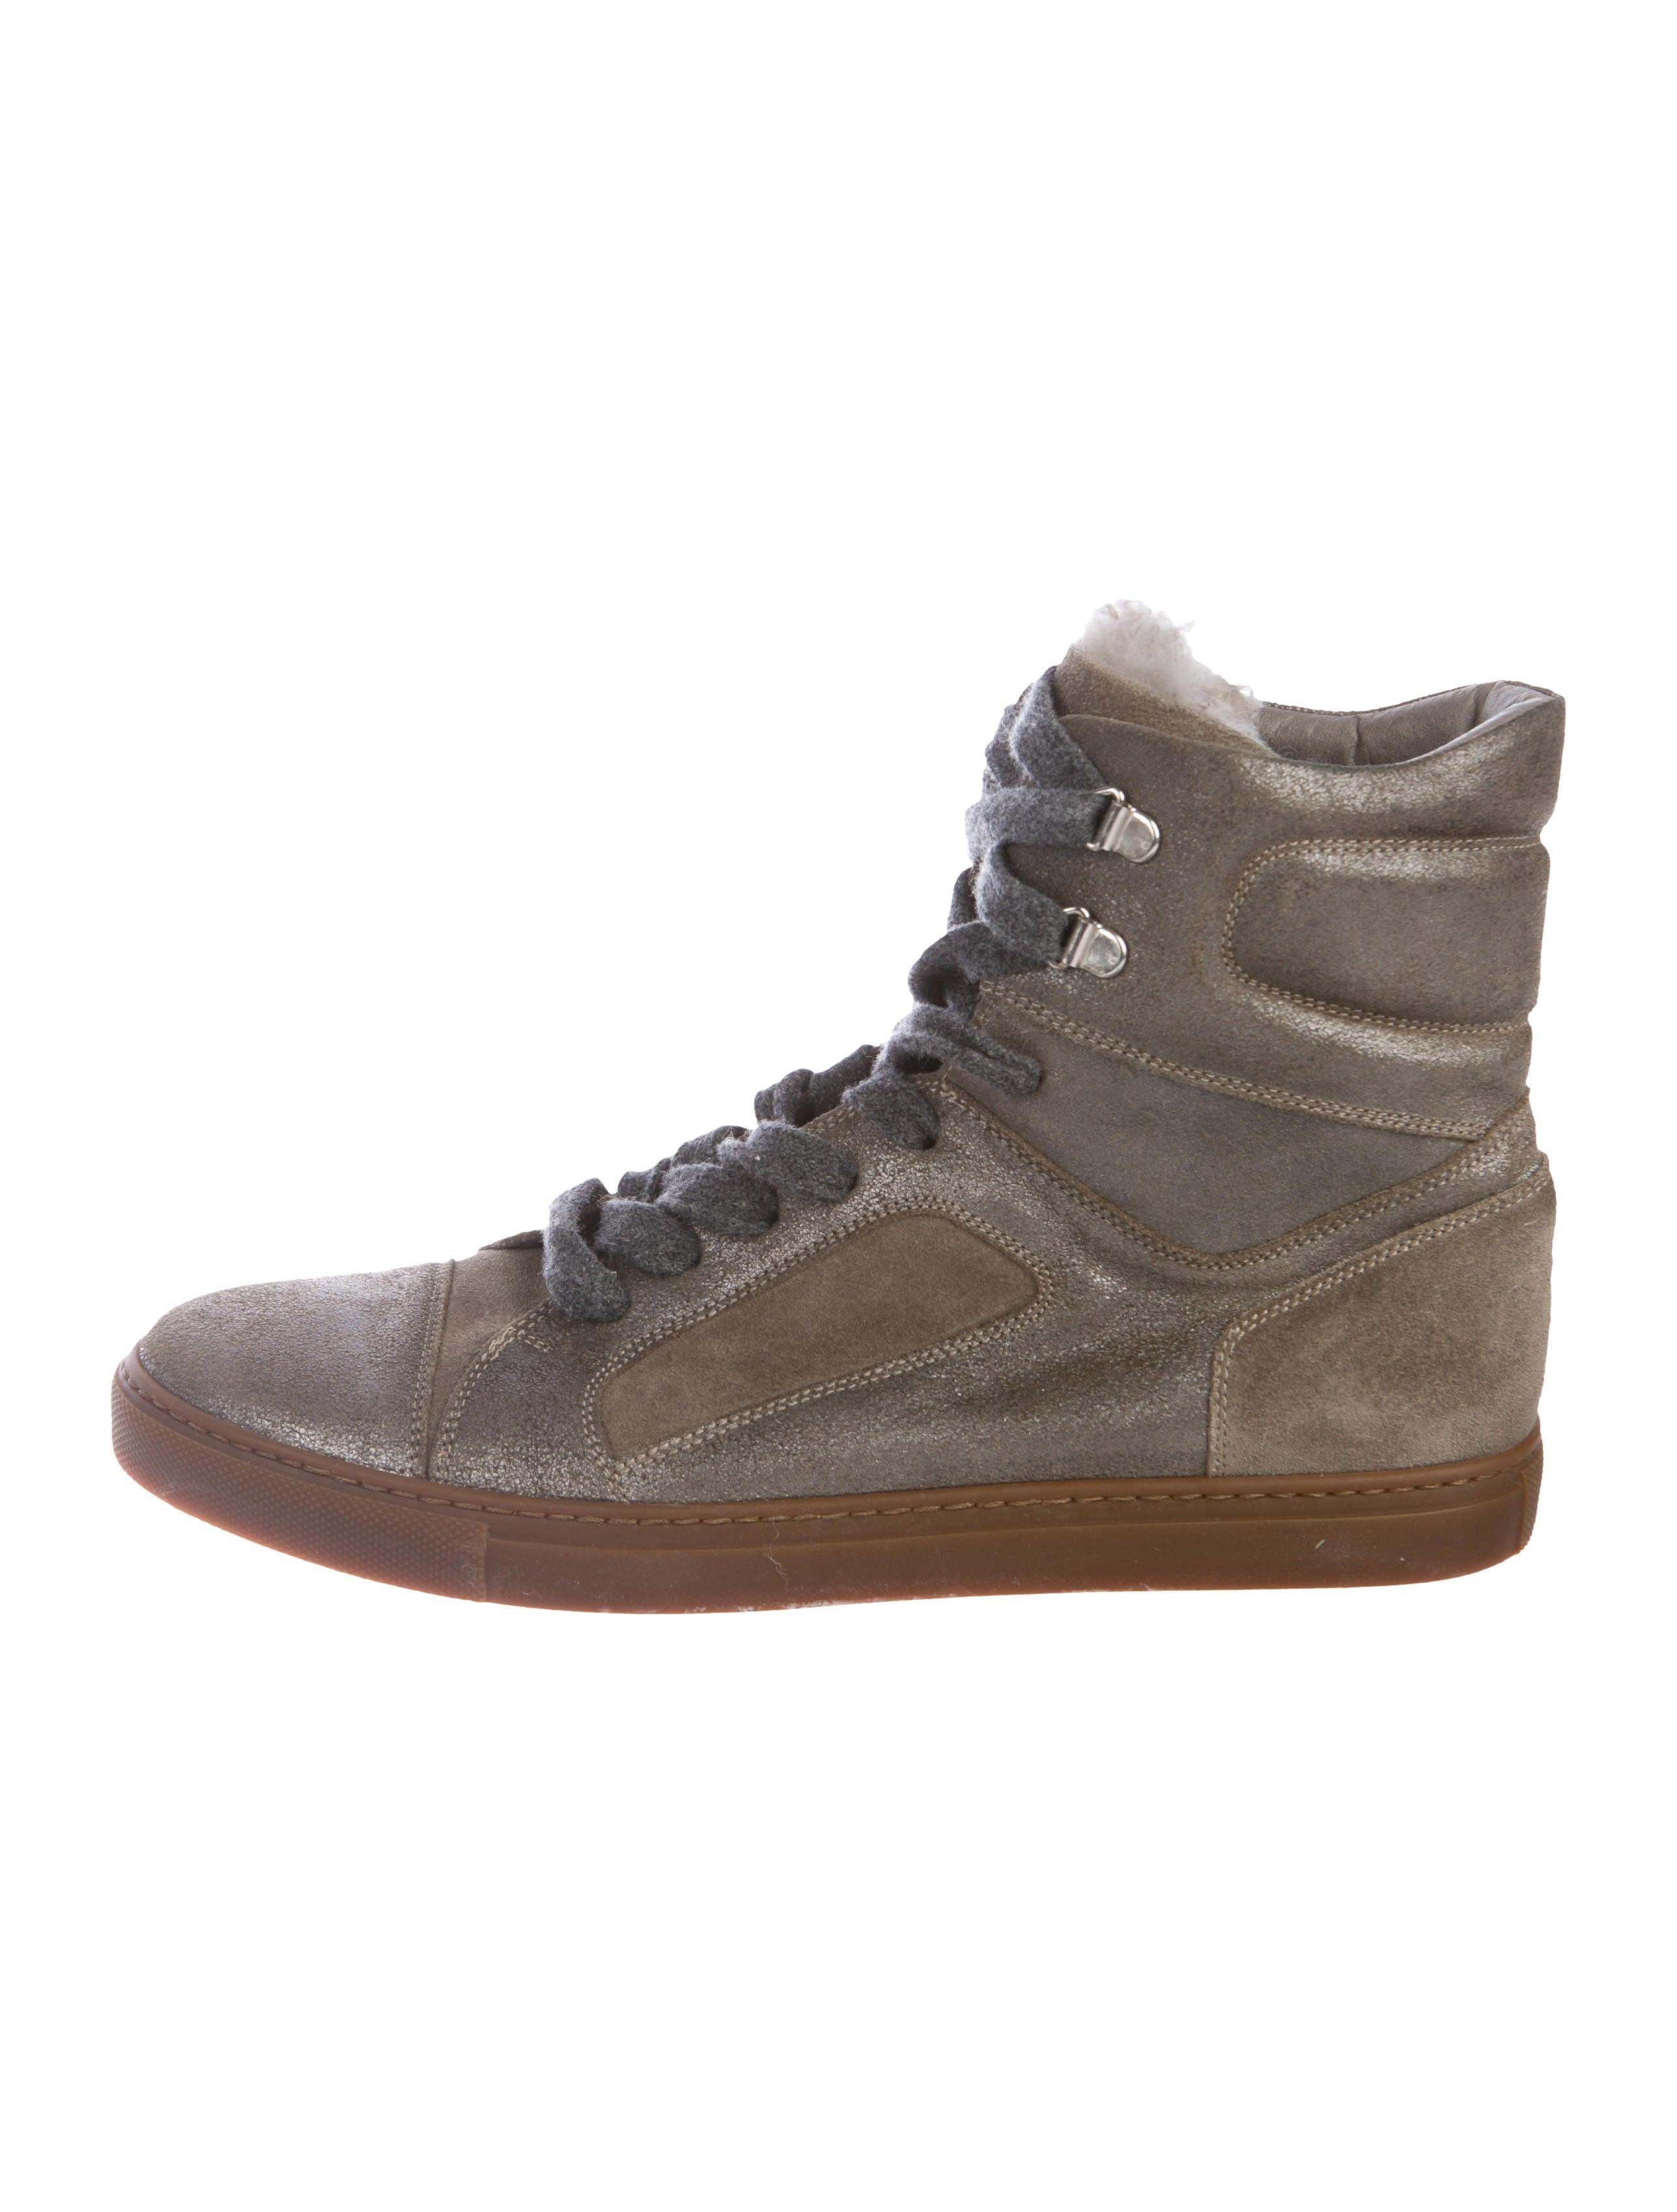 hot sale cheap online Brunello Cucinelli Shearling-Trimmed Metallic Sneakers cheap sale best sale tumblr cheap online HKOgoVgm